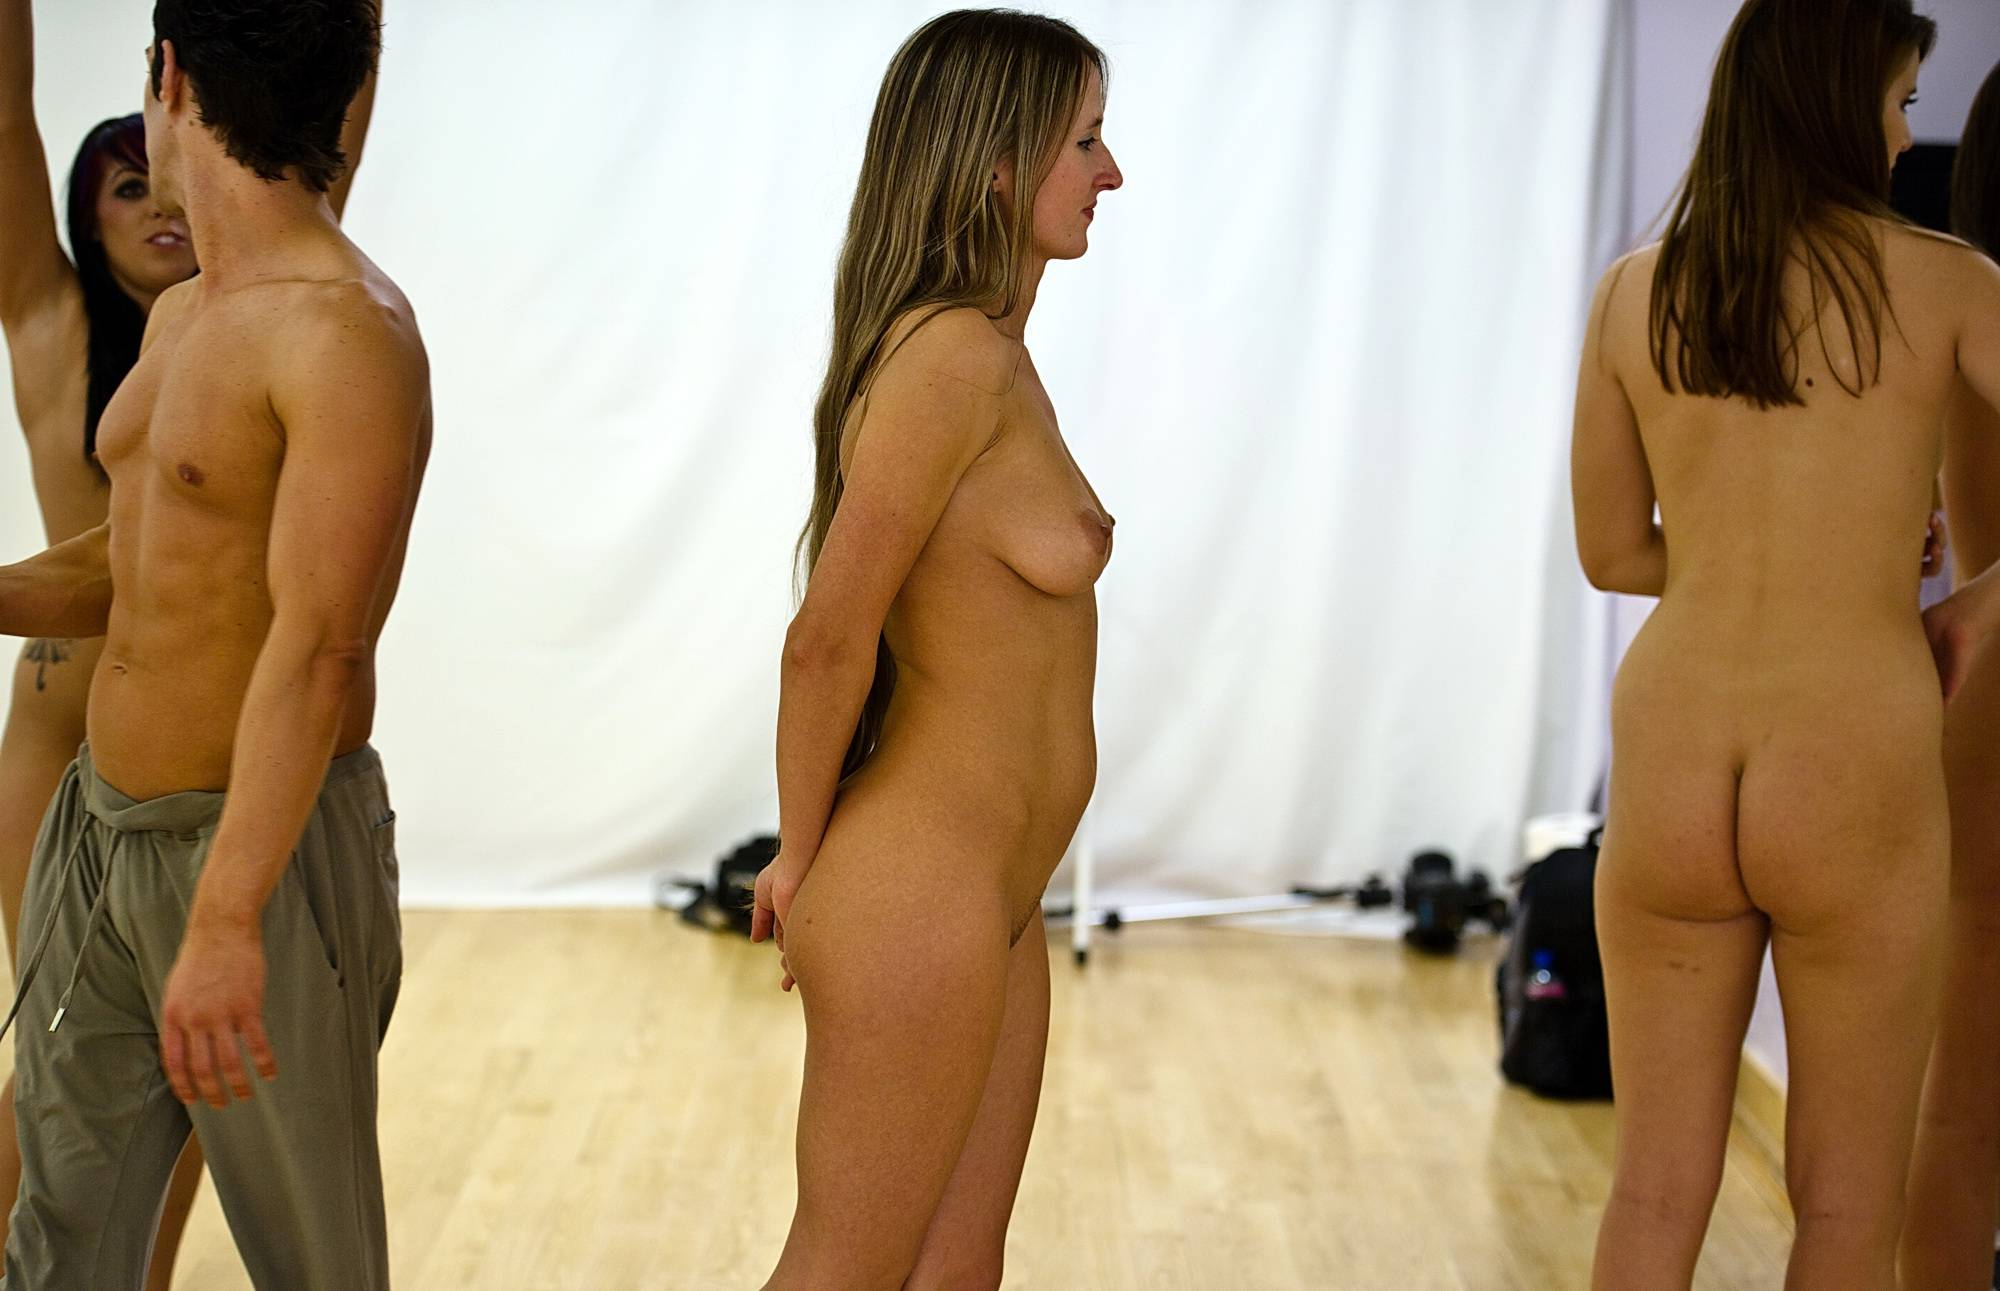 Nudist Gallery Brief Intermission Break - 2